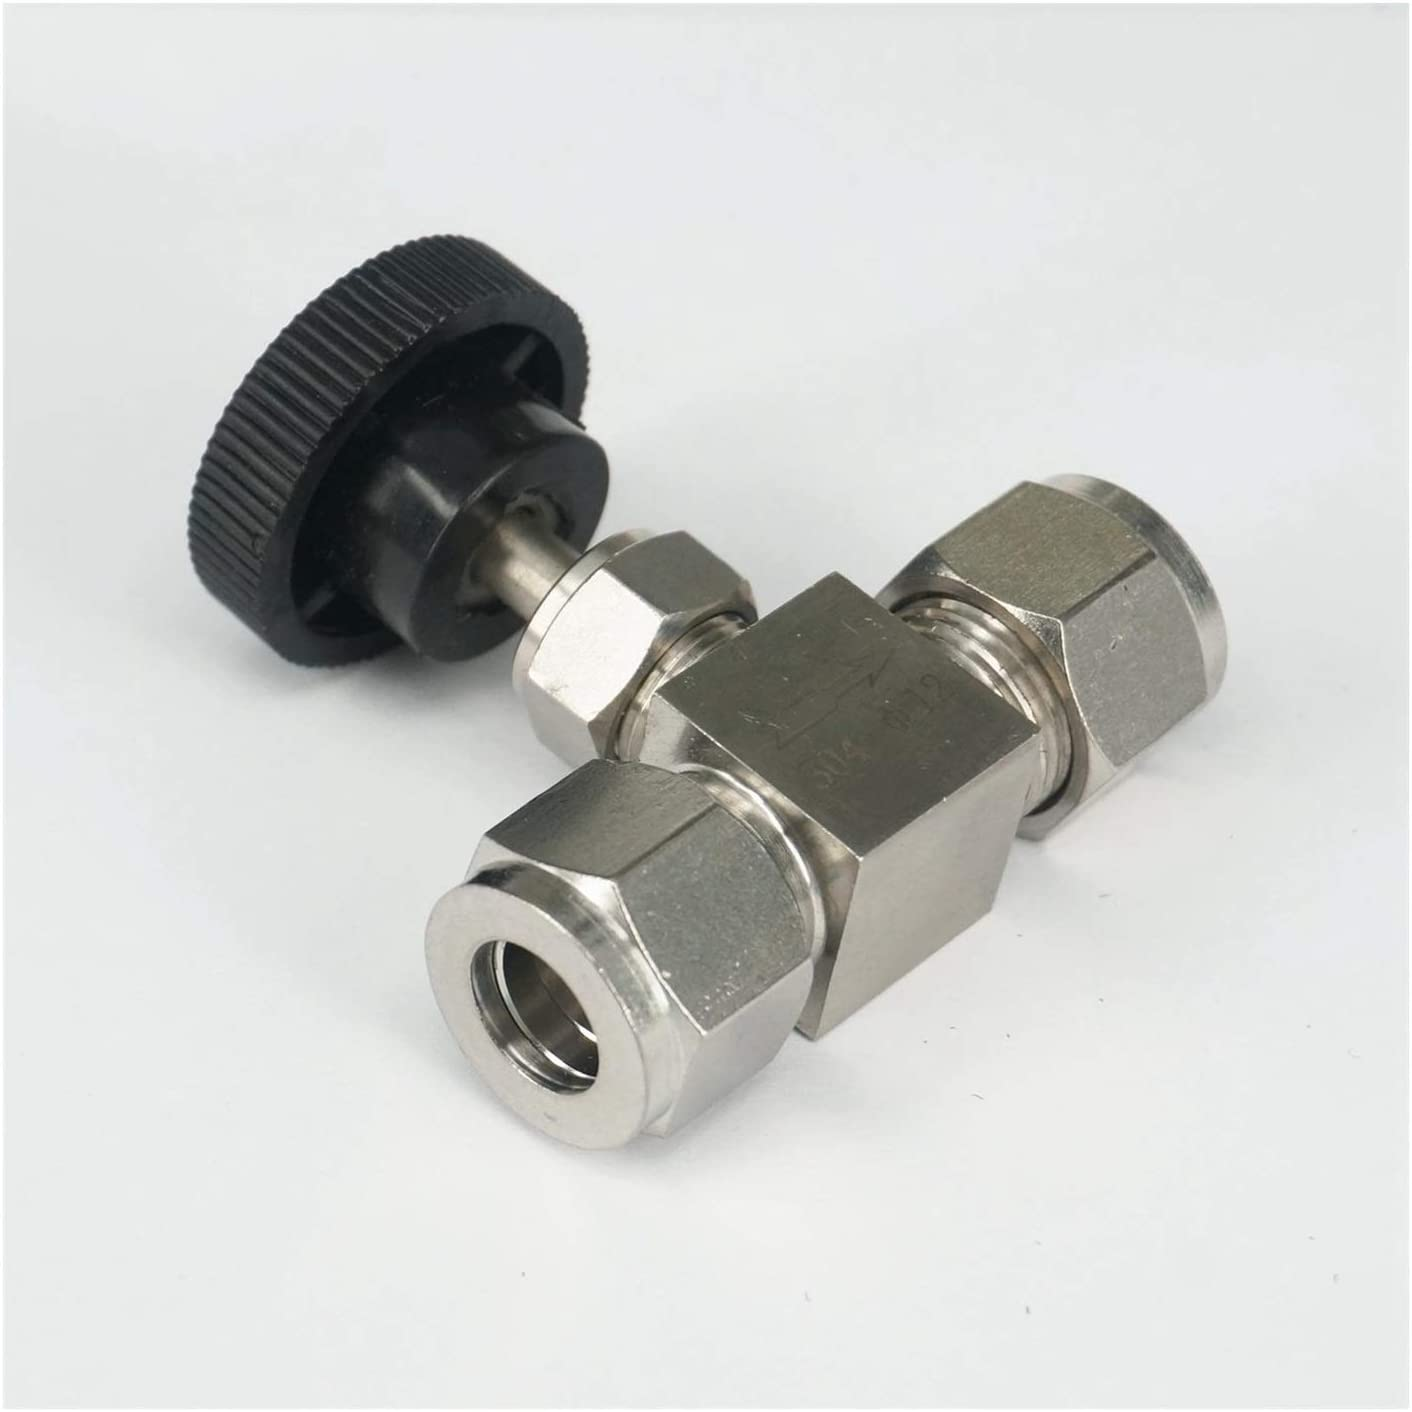 WUXUN-Valve 4mm OD Tube Needle Valve 304 Stainless Steel Shut Off Flow Control Needle Valve Compression Fitting 6.4 Mpa